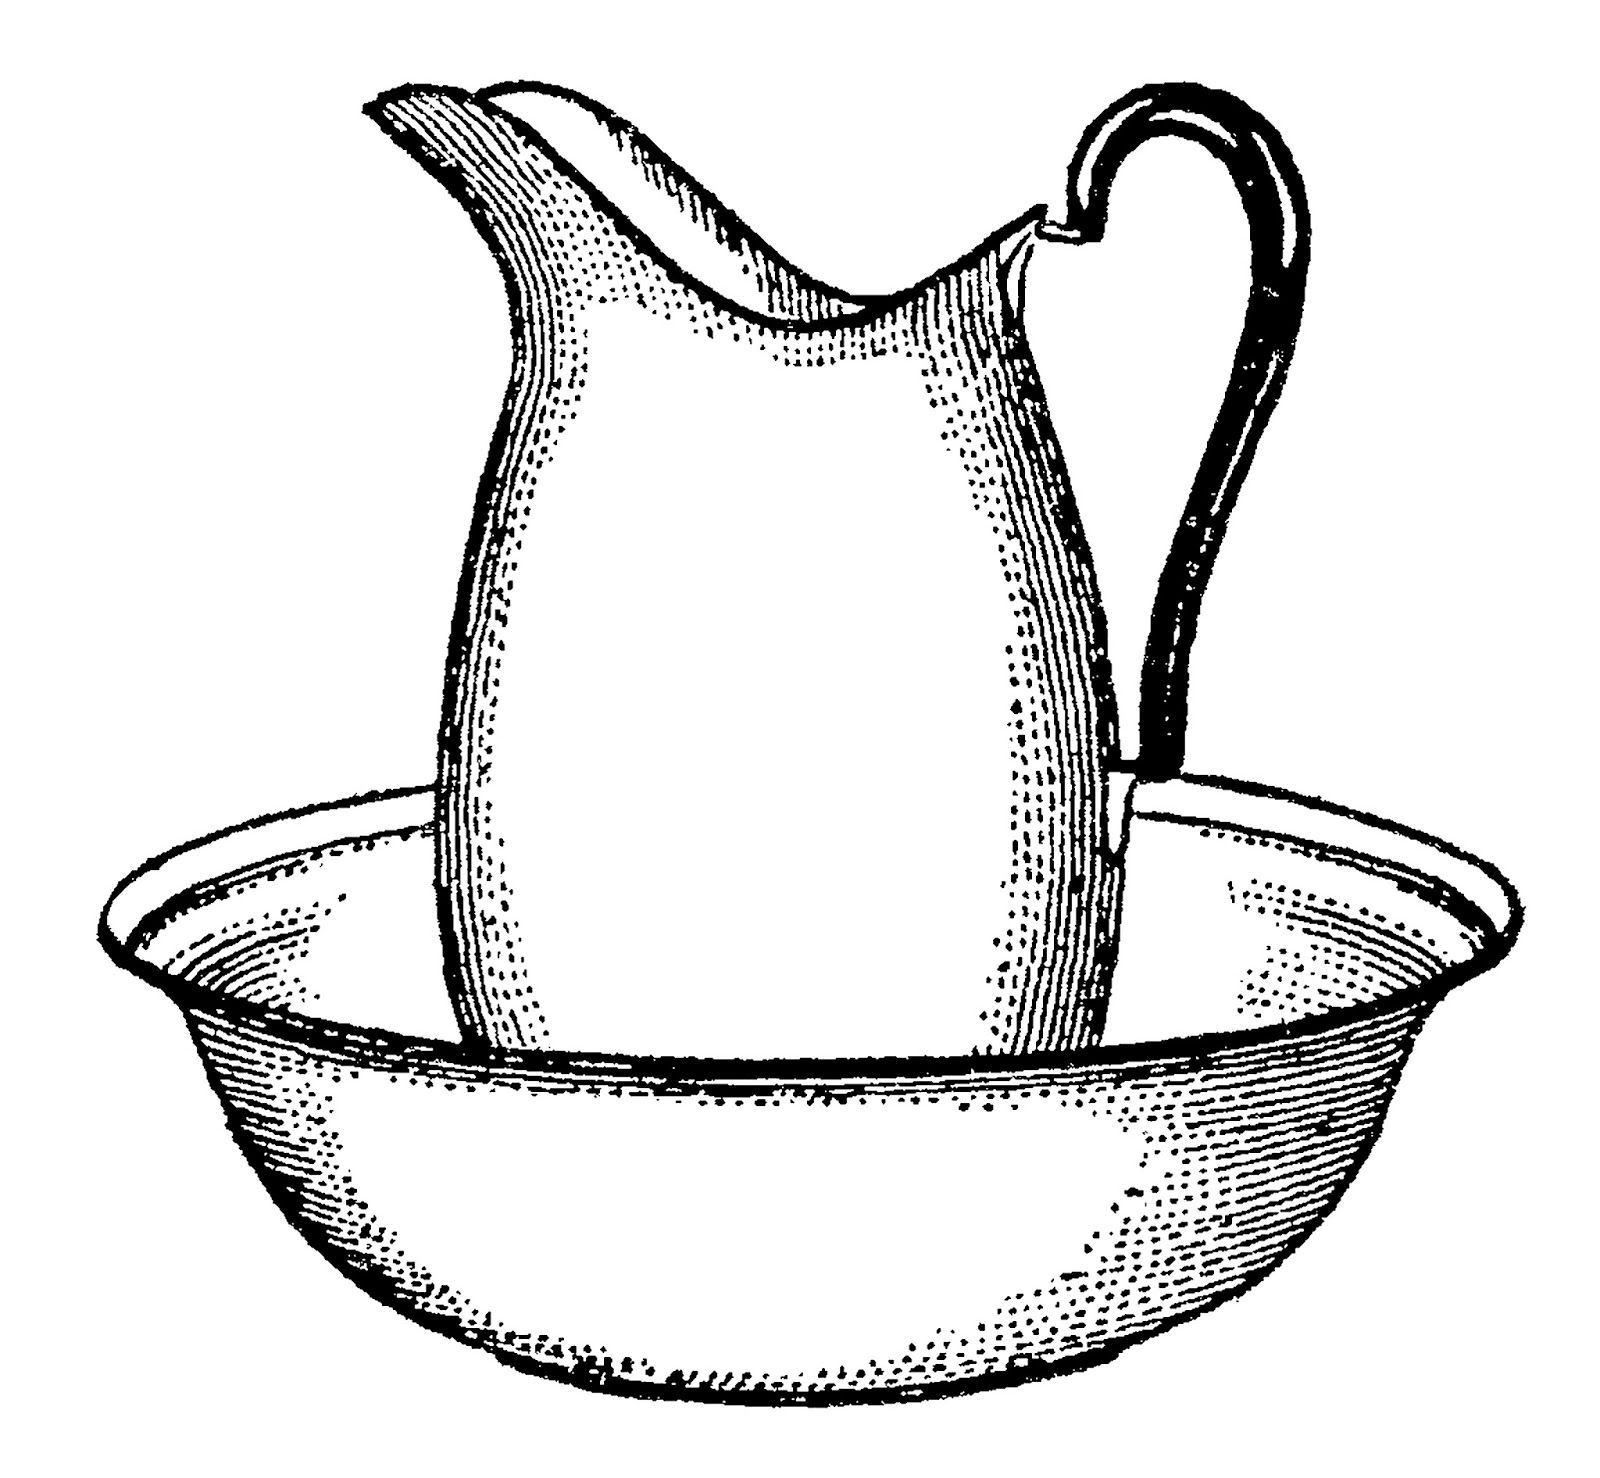 Vintage Pitcher And Bowl Bath Digital Clip Art Clip Art Vintage Digital Clip Art Antique Images